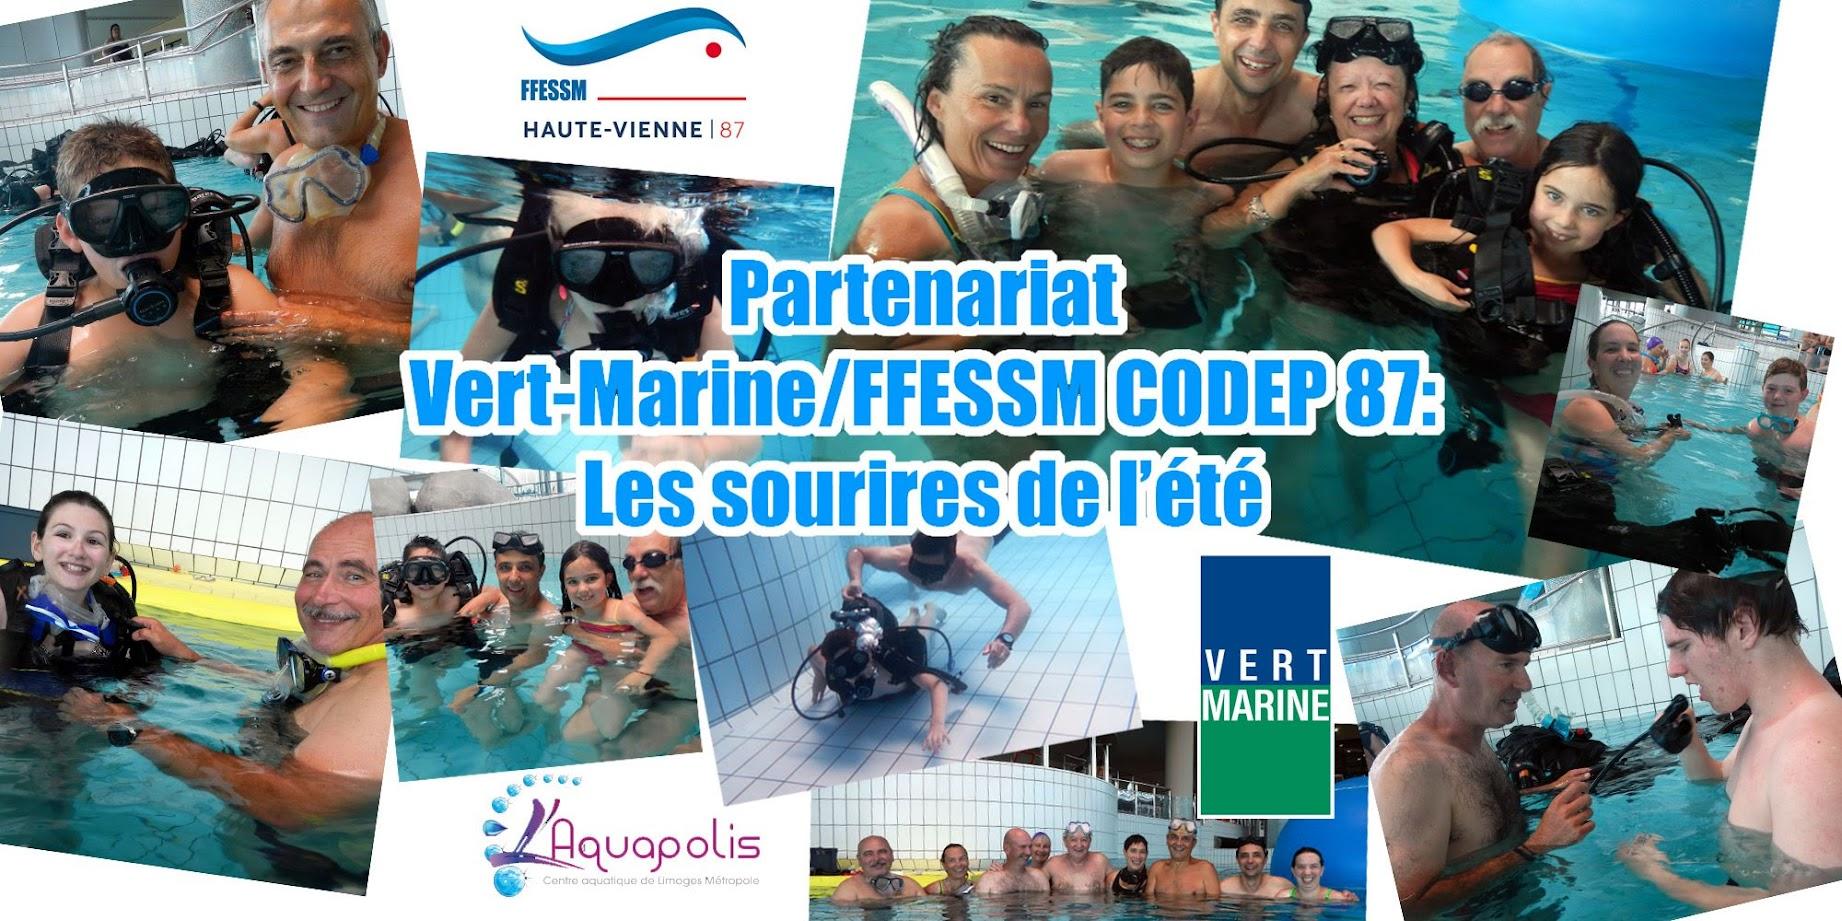 FFESSM COSEP 87 Vert Marine l'aquapolis Limoges Metropole